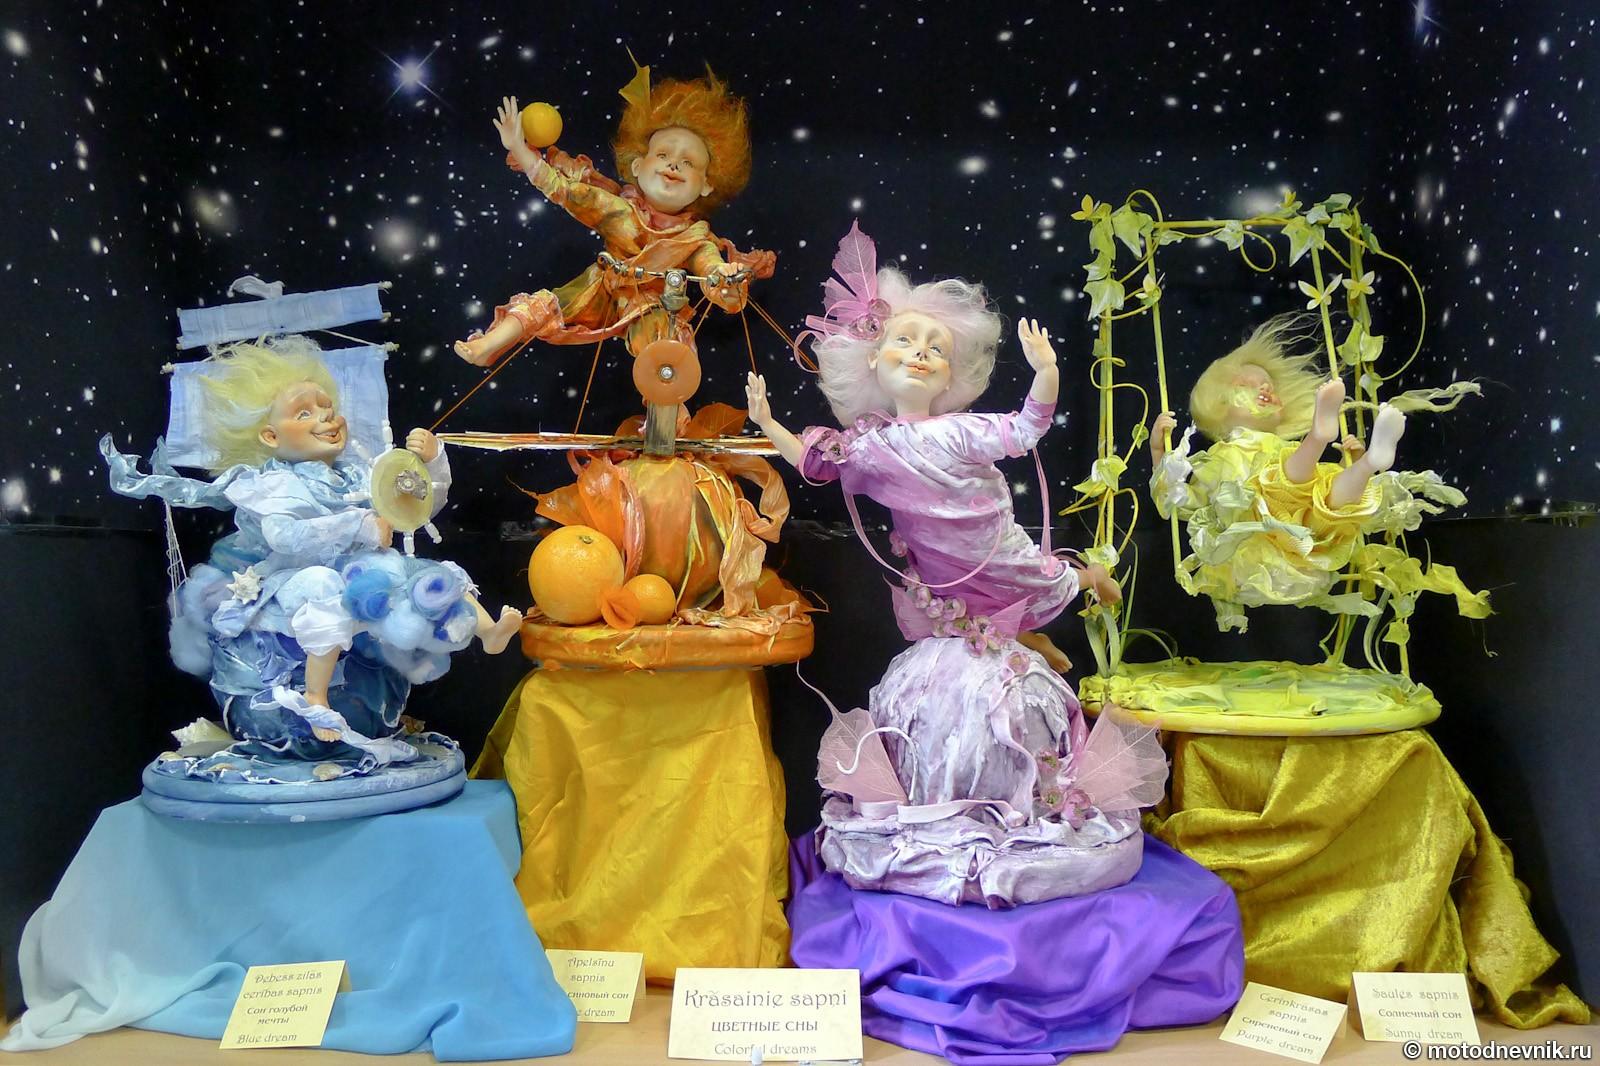 Картинки по запросу прейли музей кукол